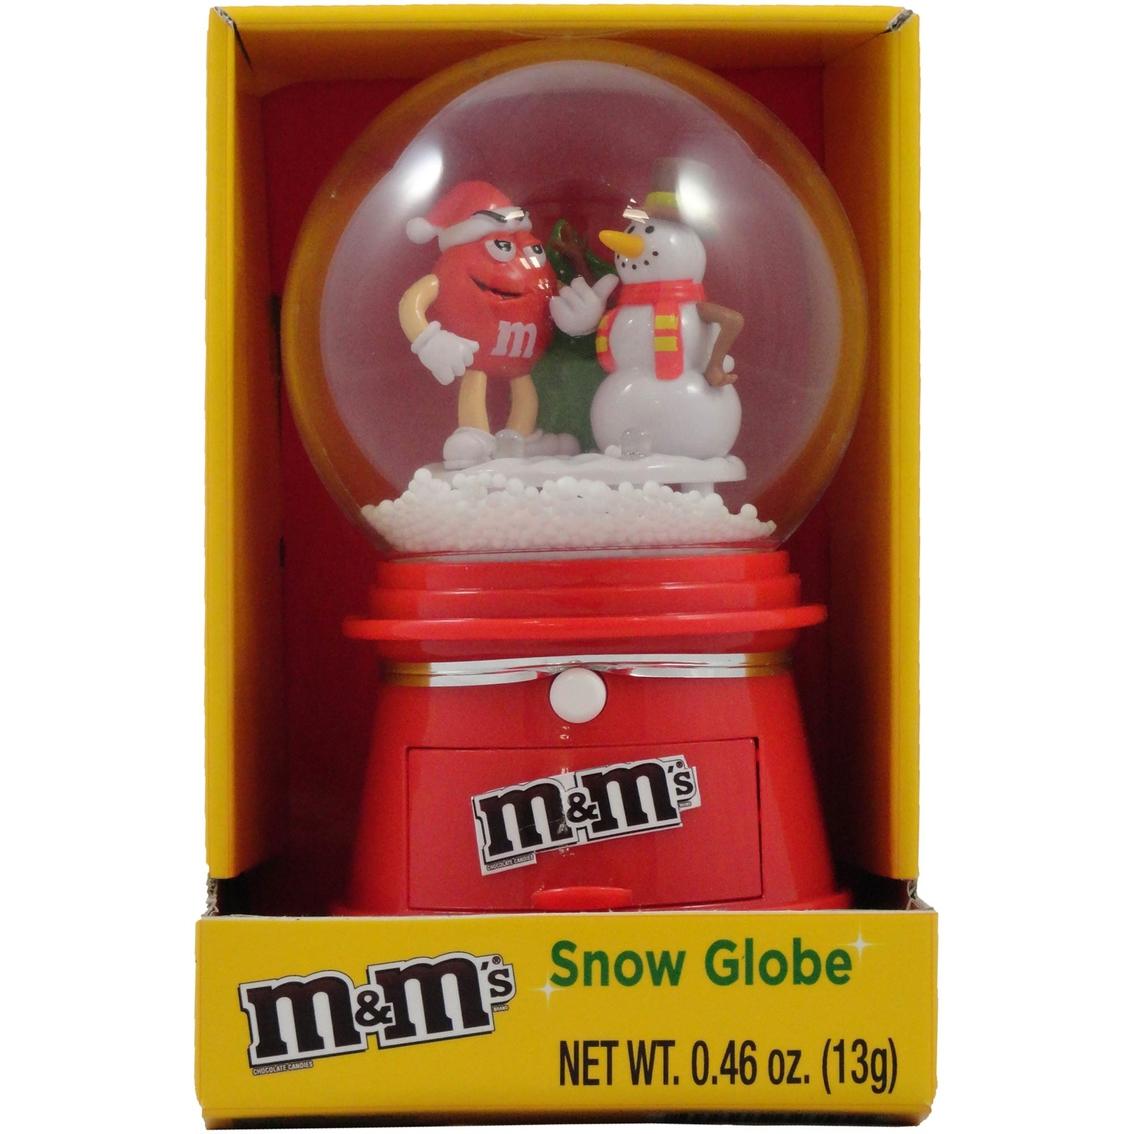 M&M Christmas Winter Snow Globe With Chocolate Candies